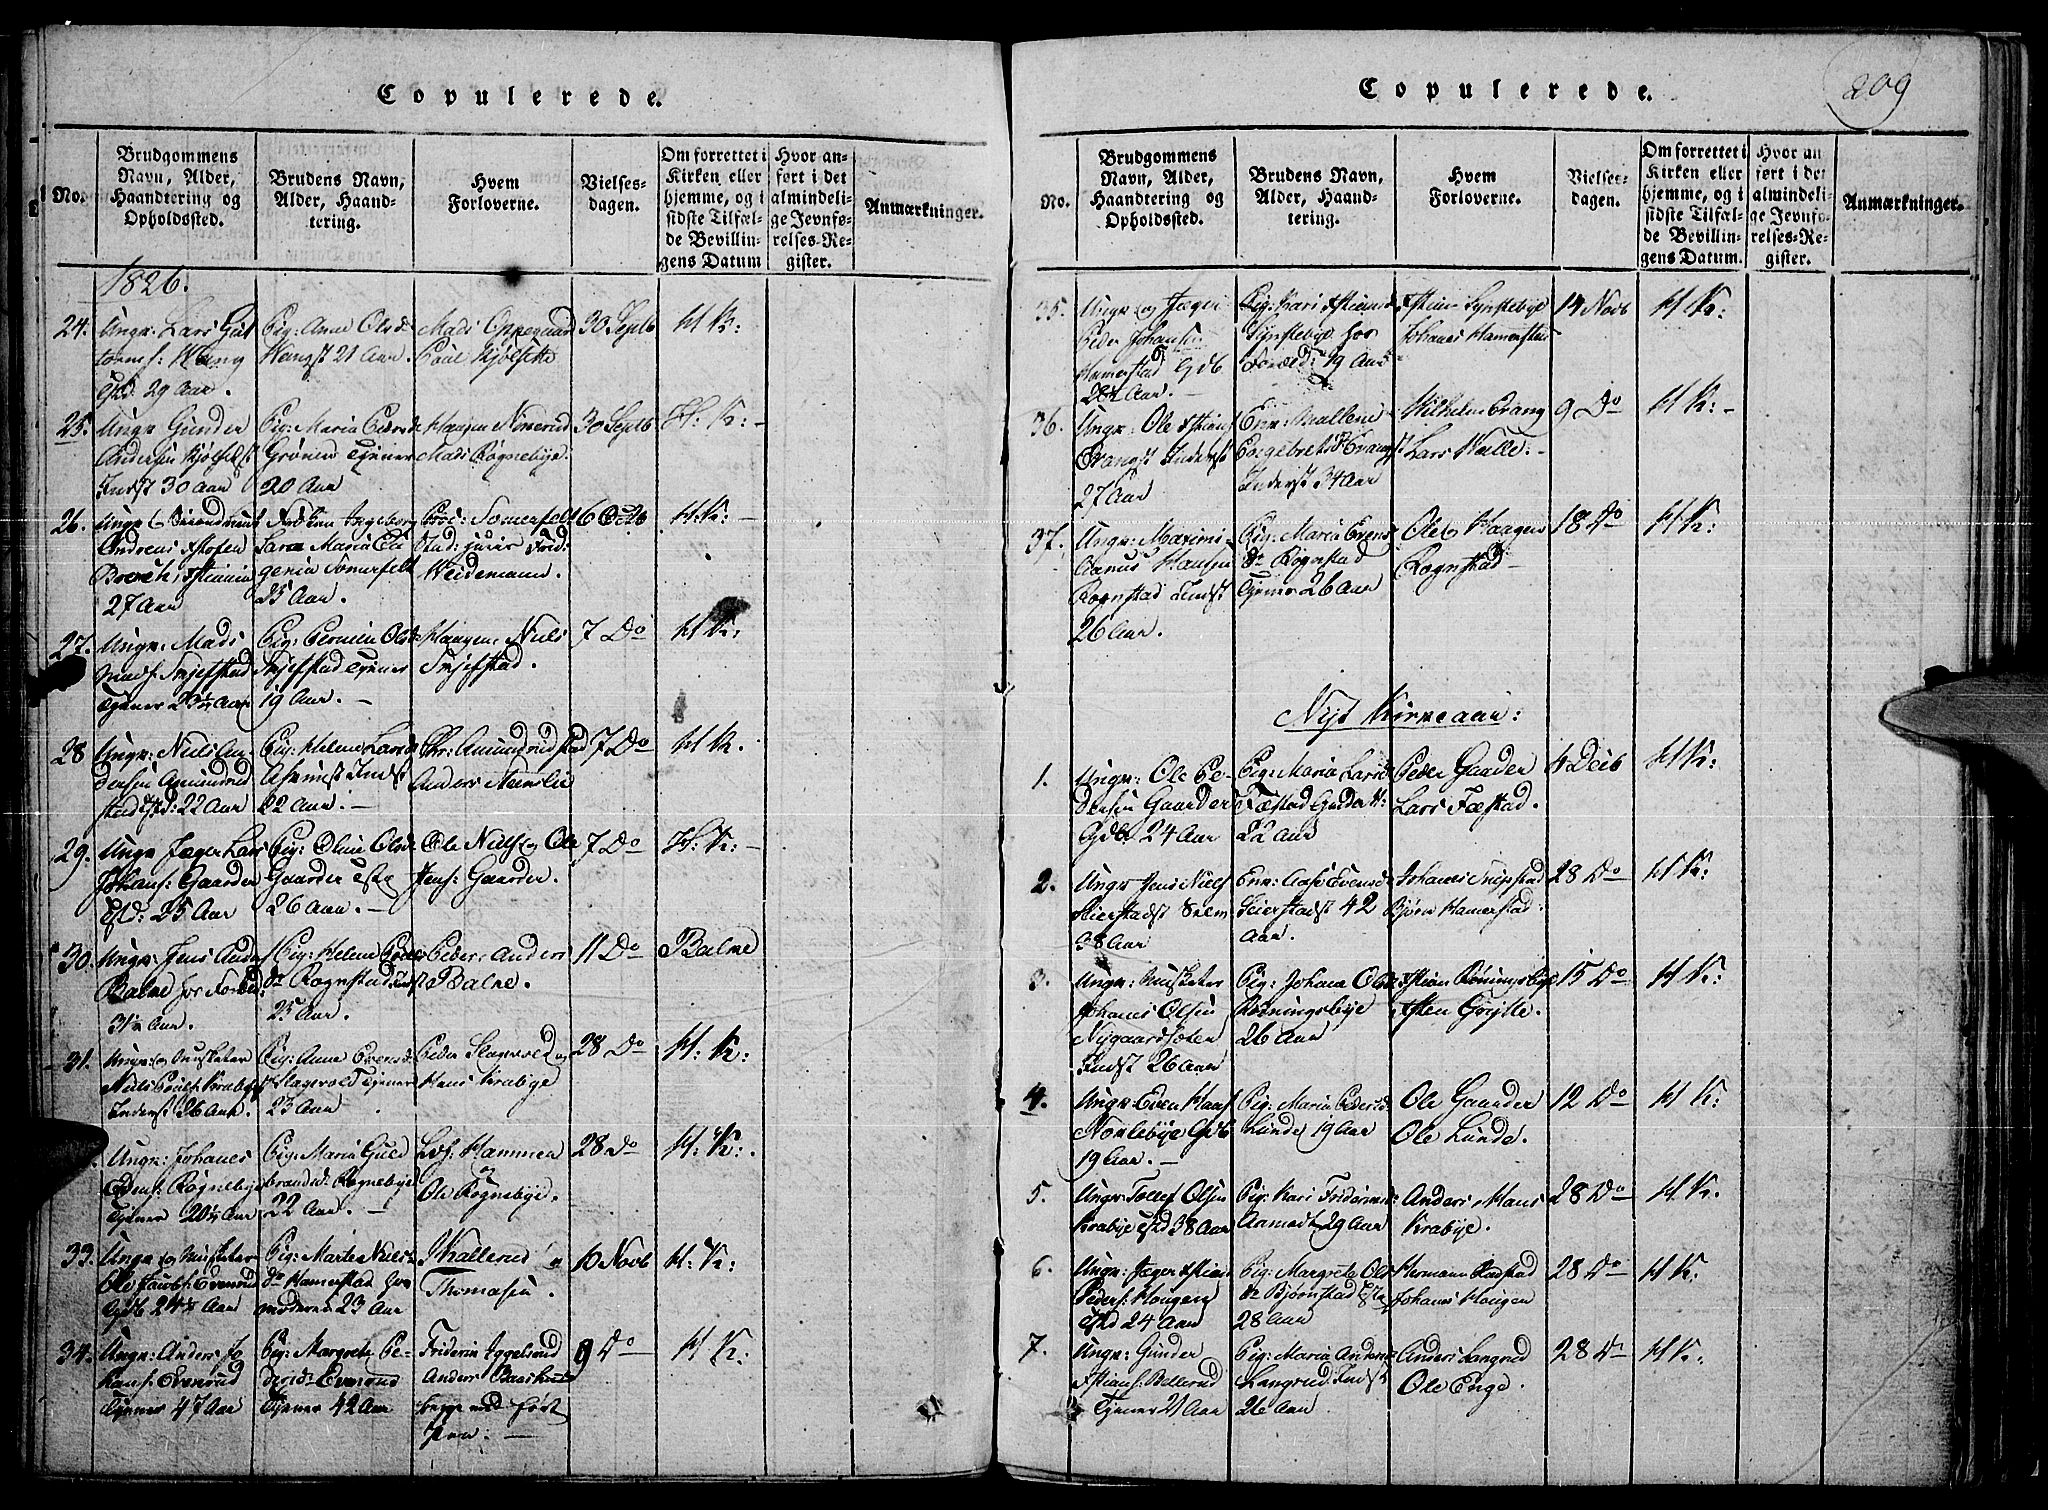 SAH, Toten prestekontor, Ministerialbok nr. 10, 1820-1828, s. 209